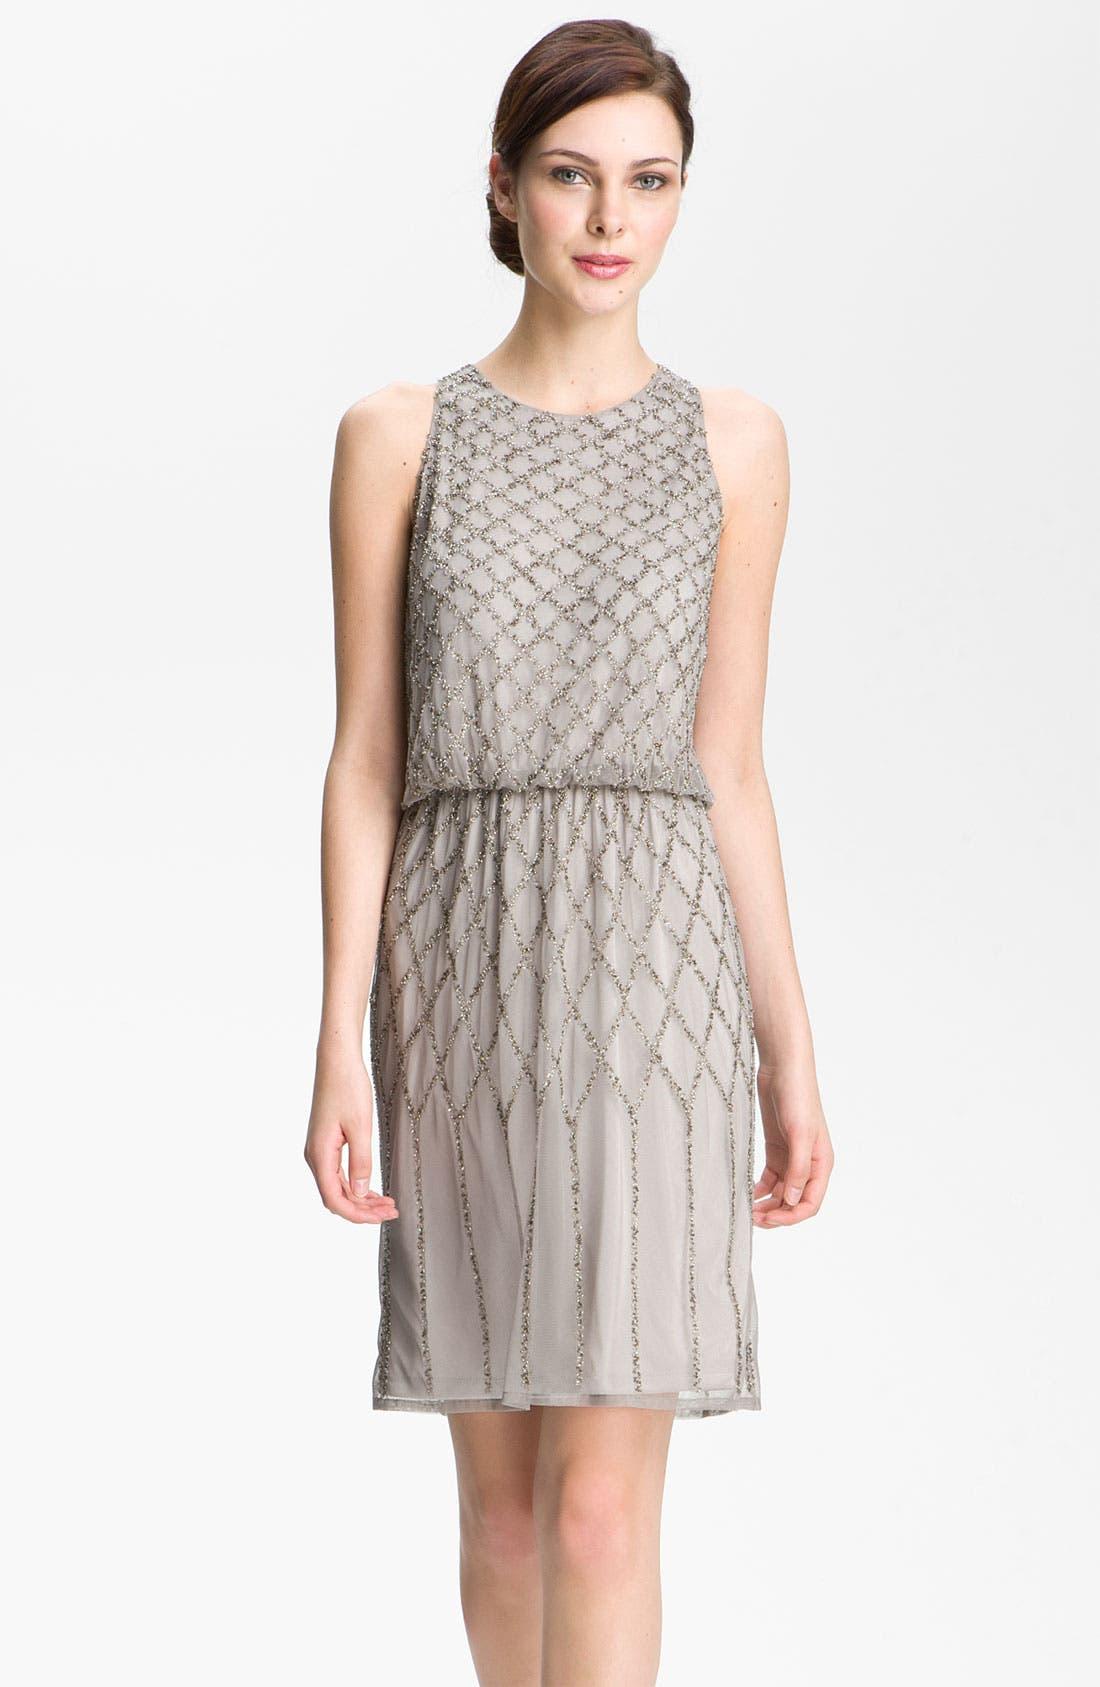 Alternate Image 1 Selected - Adrianna Papell Beaded Blouson Dress